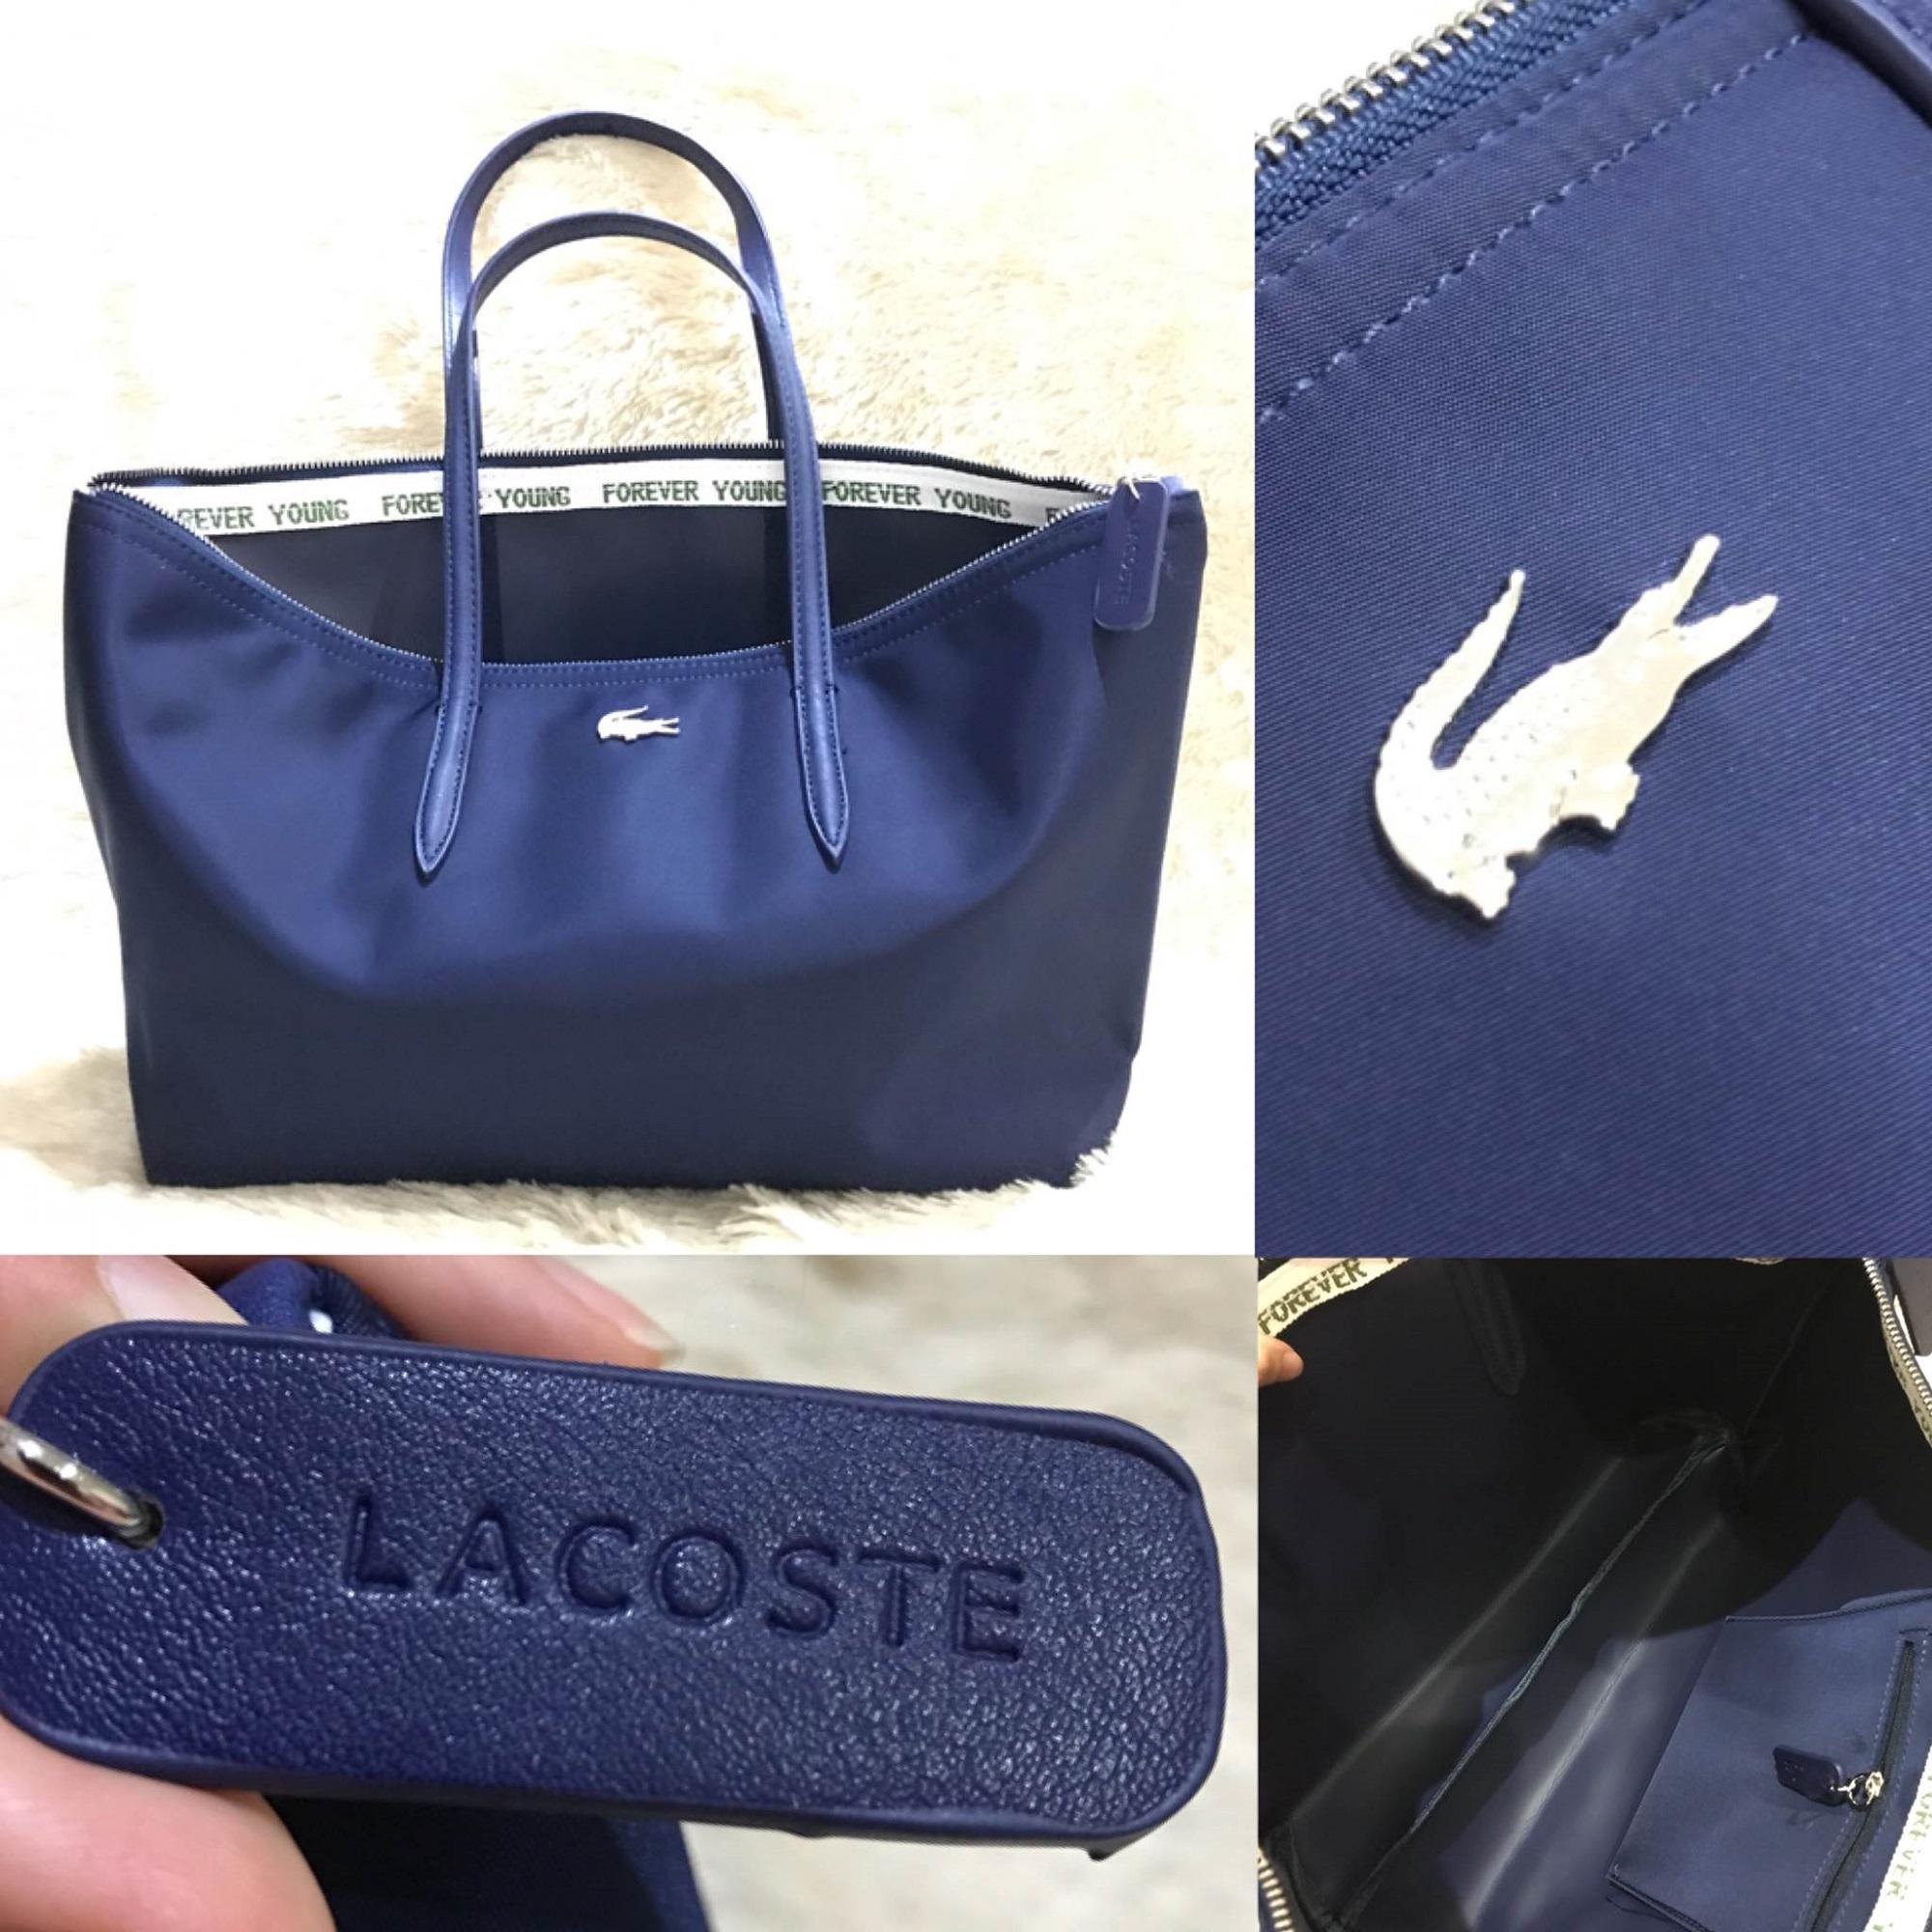 tas wanita grosir import murah branded, LACOSTE MOTIF IMPORT